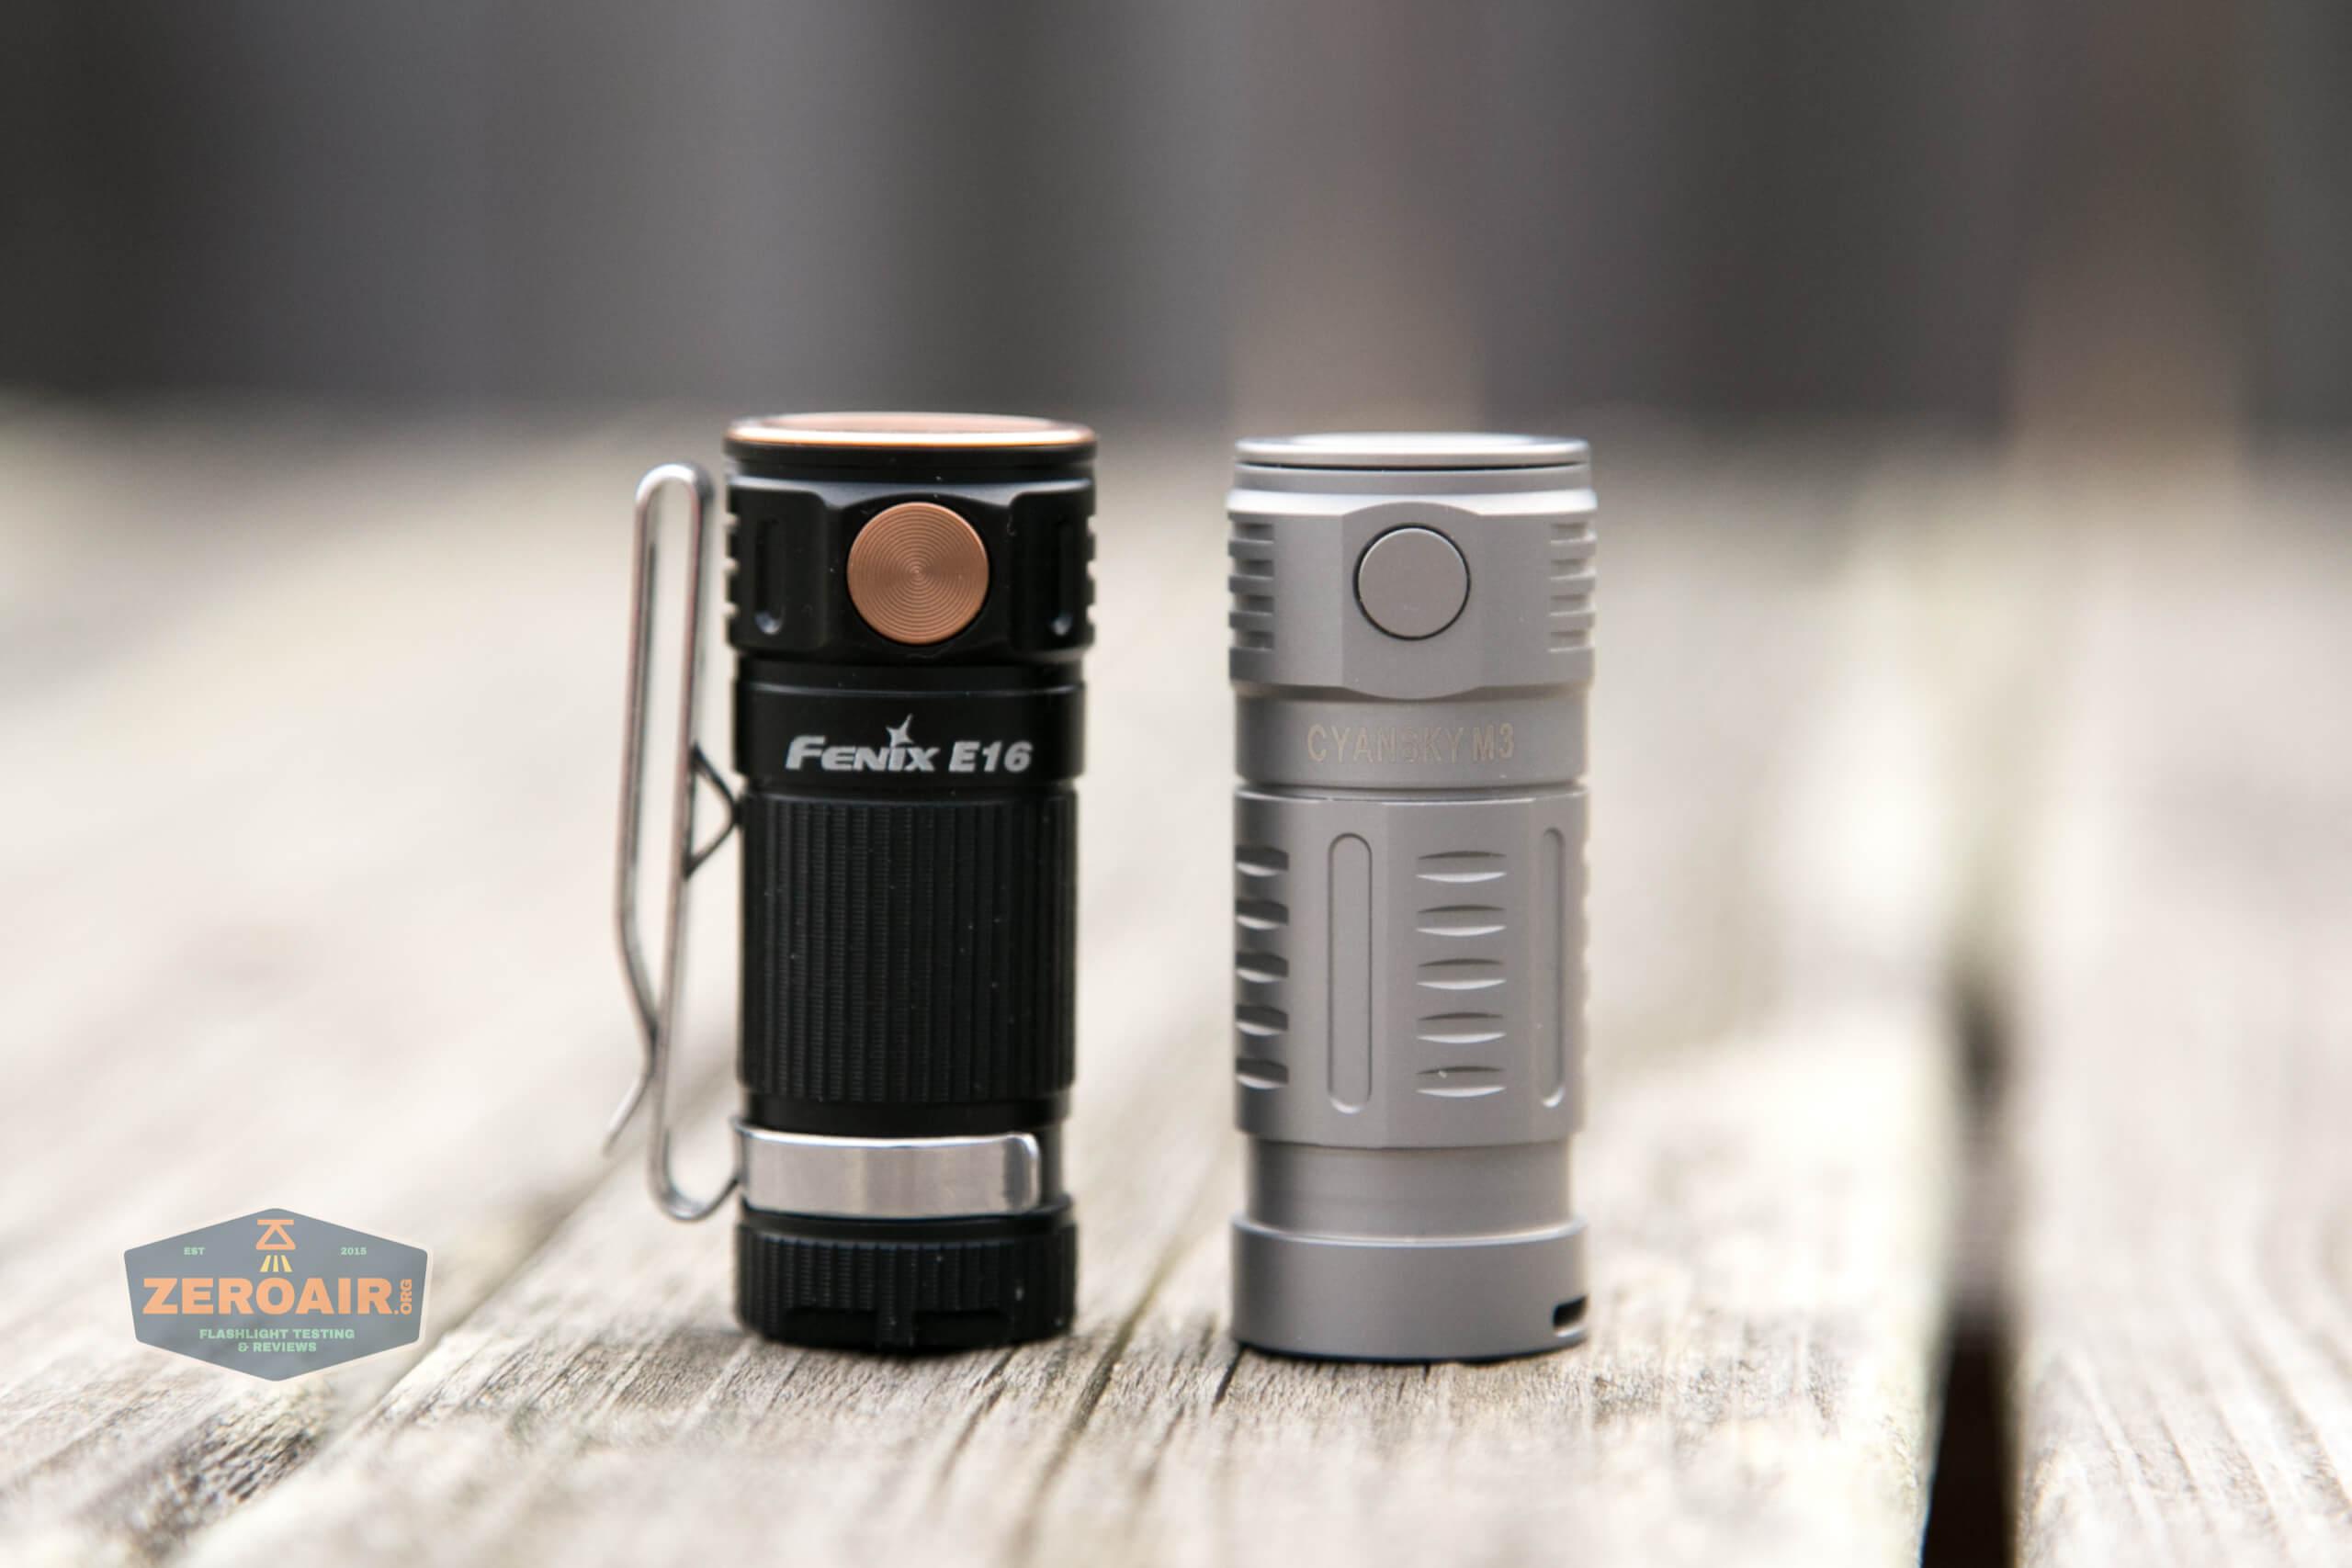 freasygears cyansky m3 titanium pocket flashlight beside fenix e16